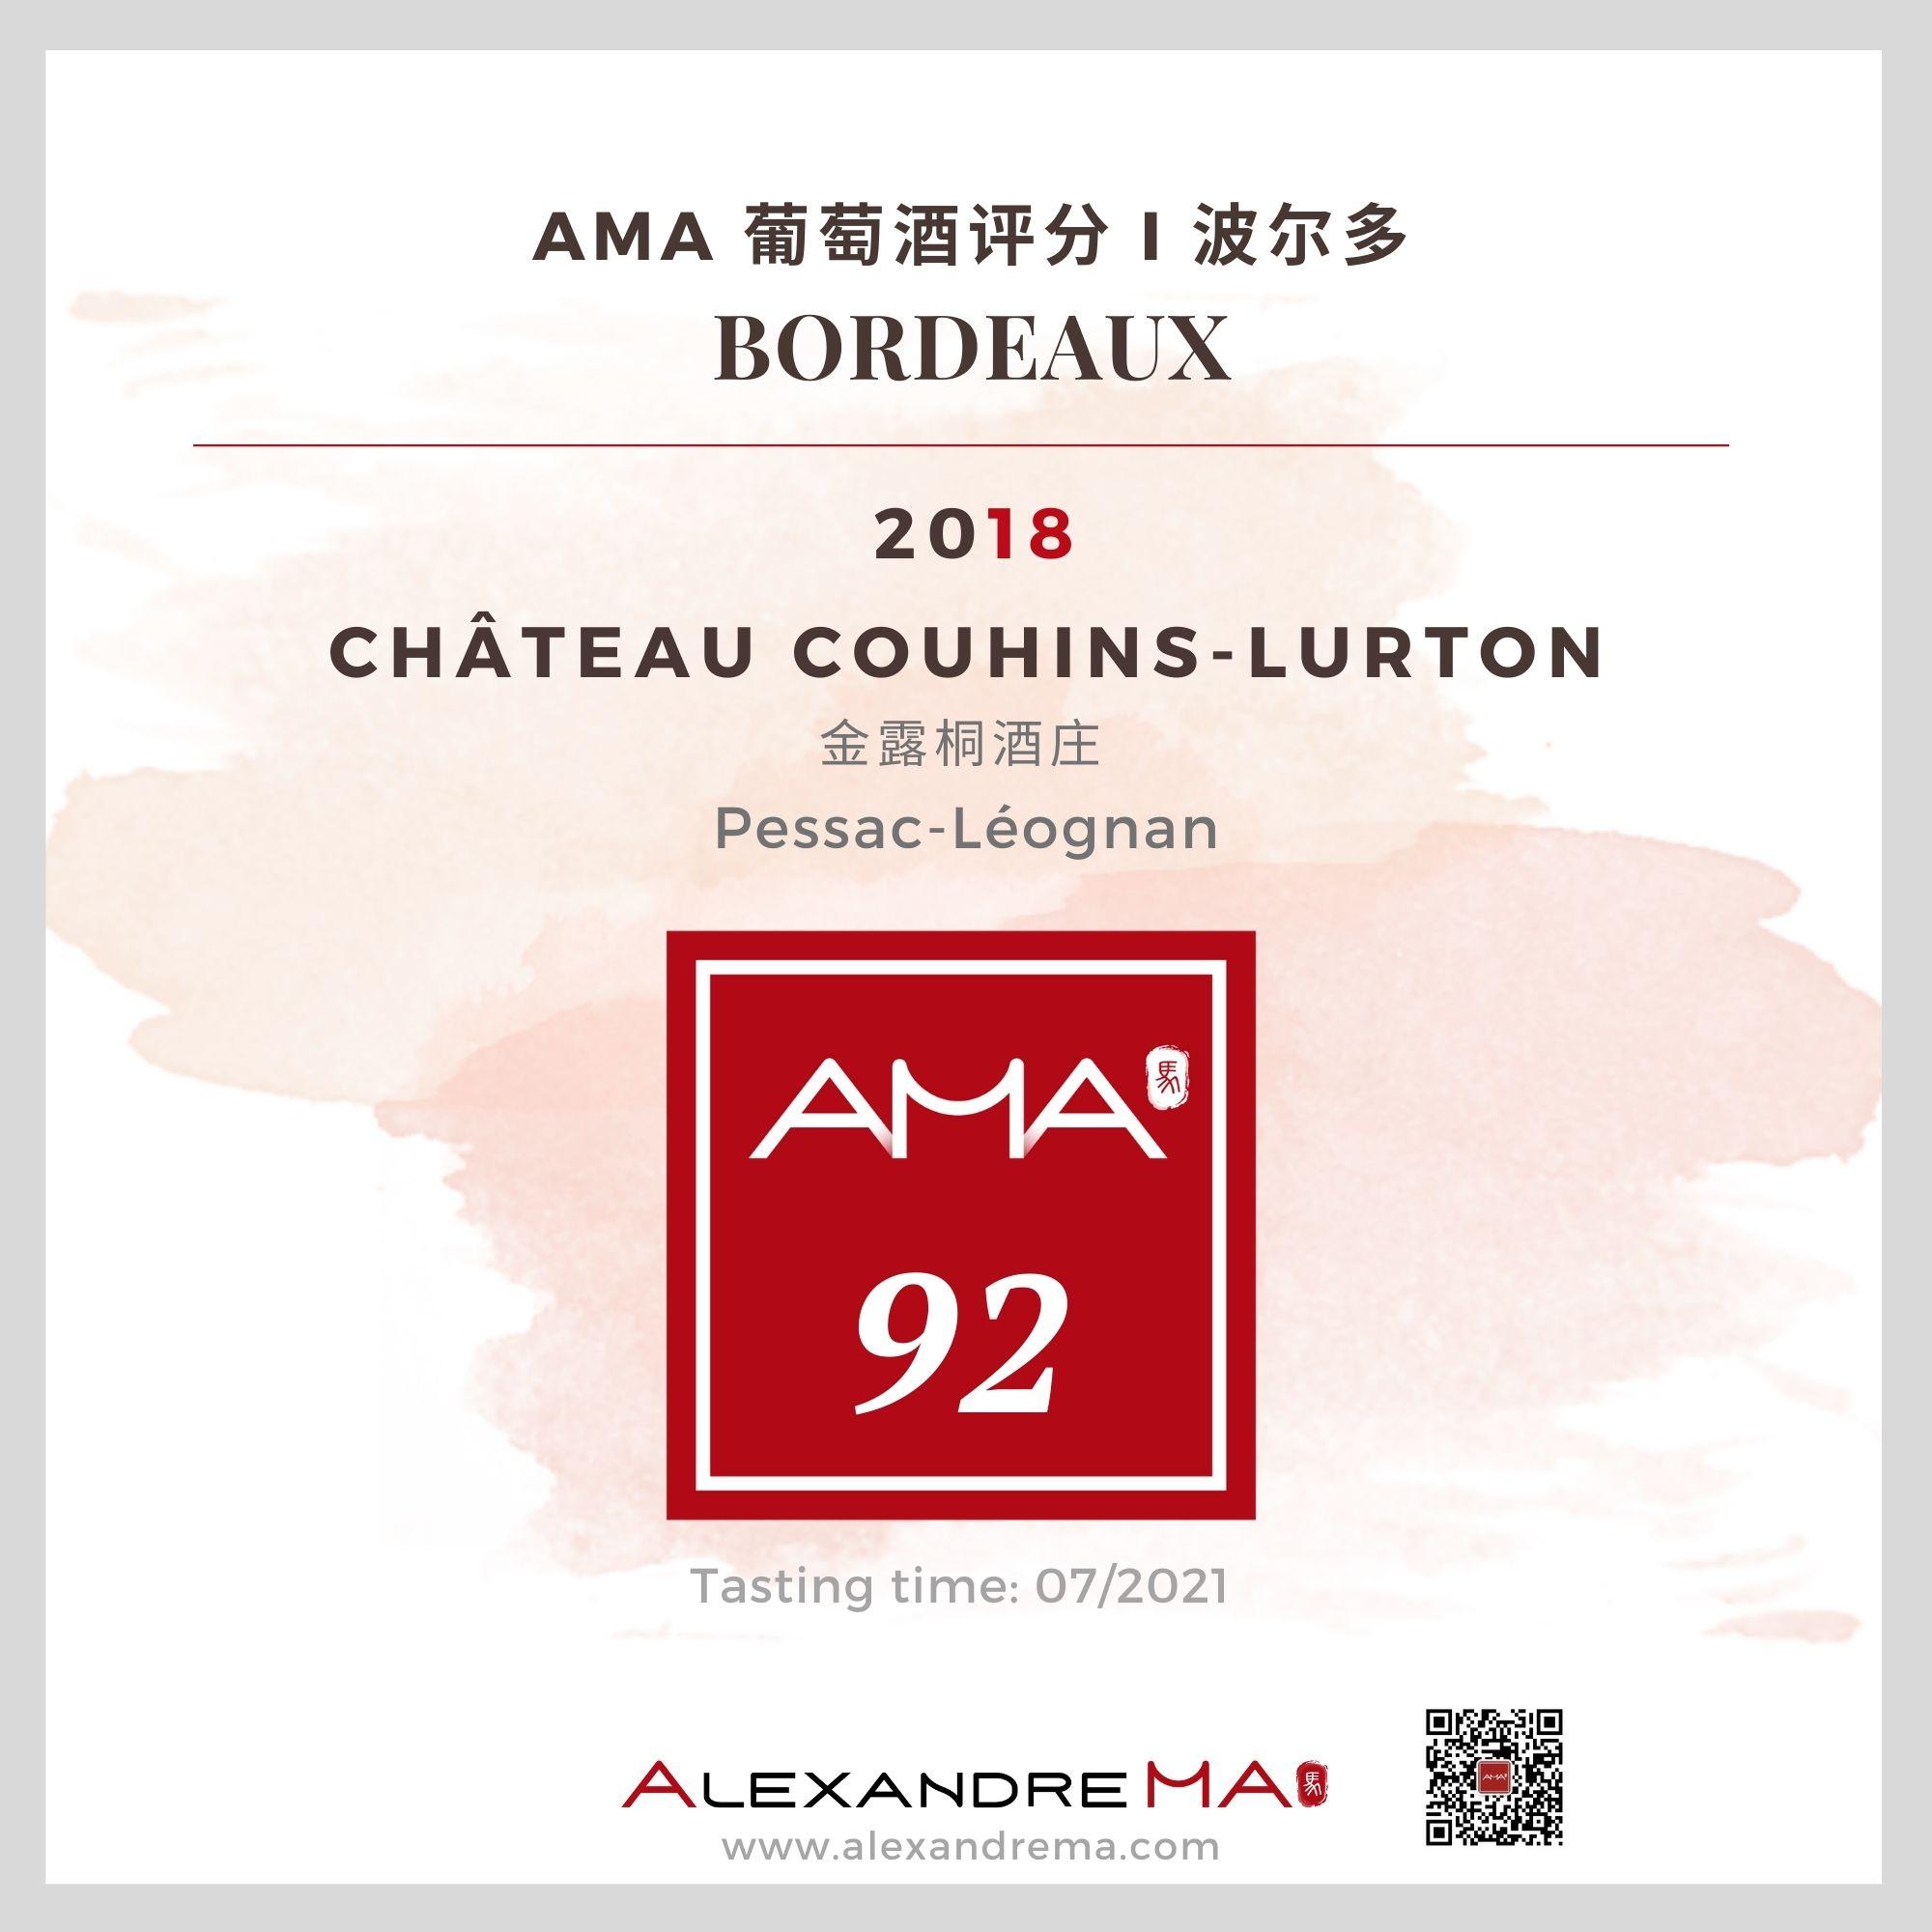 Château Couhins-Lurton 2018 金露桐酒庄 - Alexandre Ma